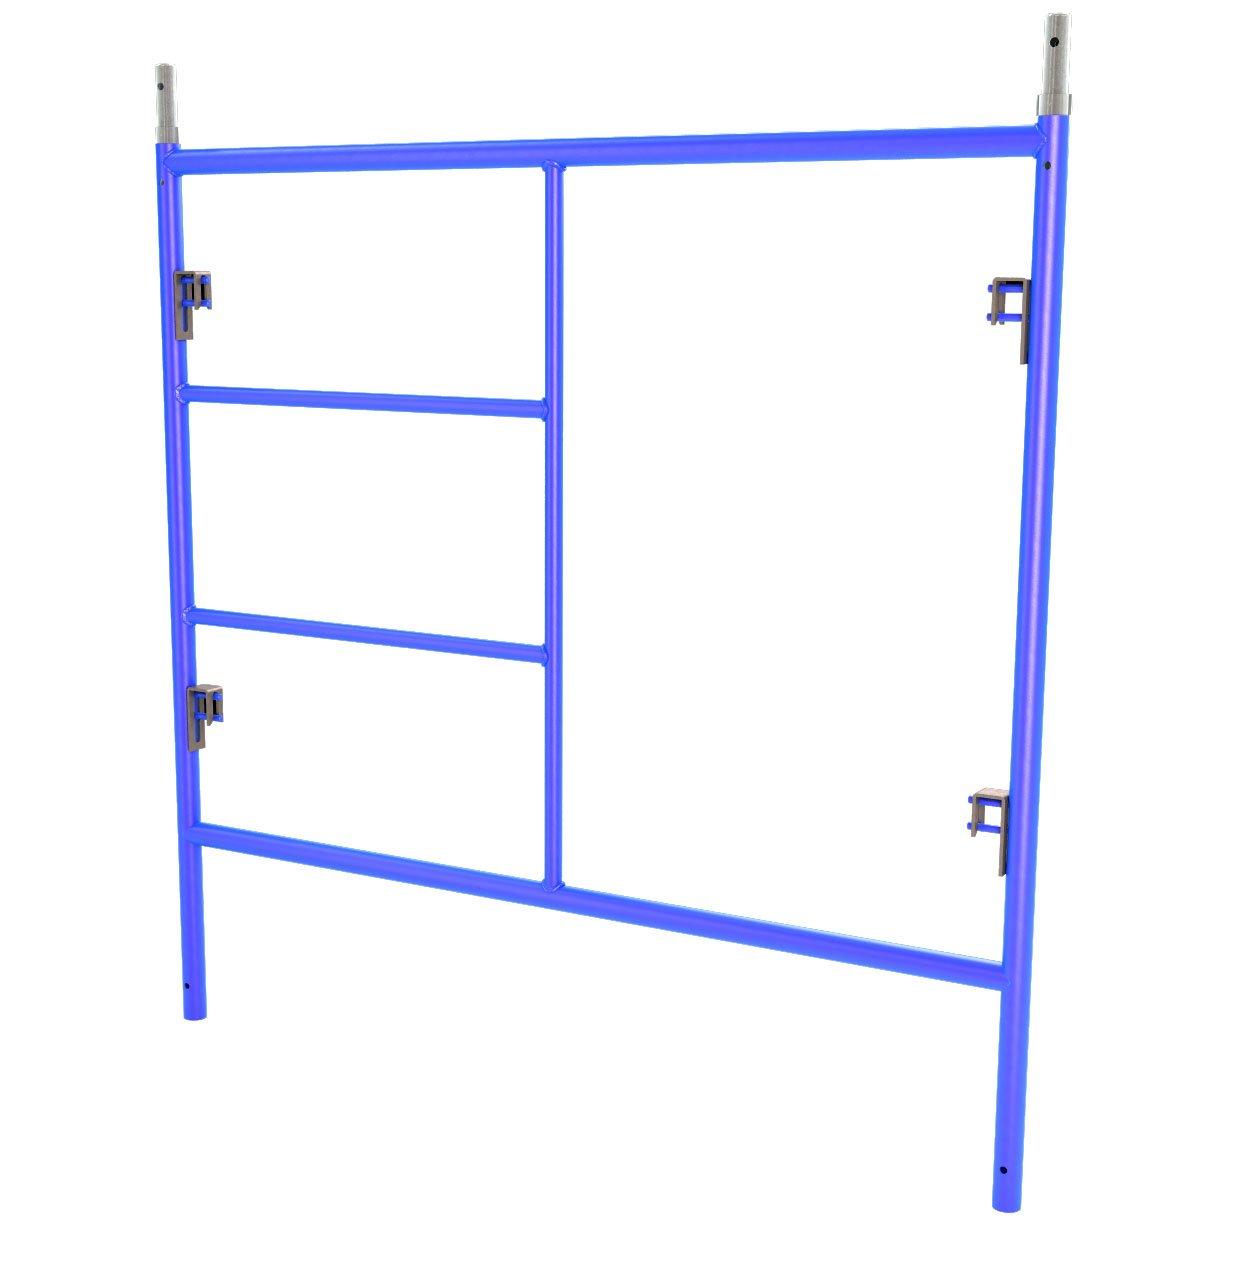 Bon 14-202 Step Type Scaffold End Frame, 5-Feet High, 5-Feet Wide, Made in USA